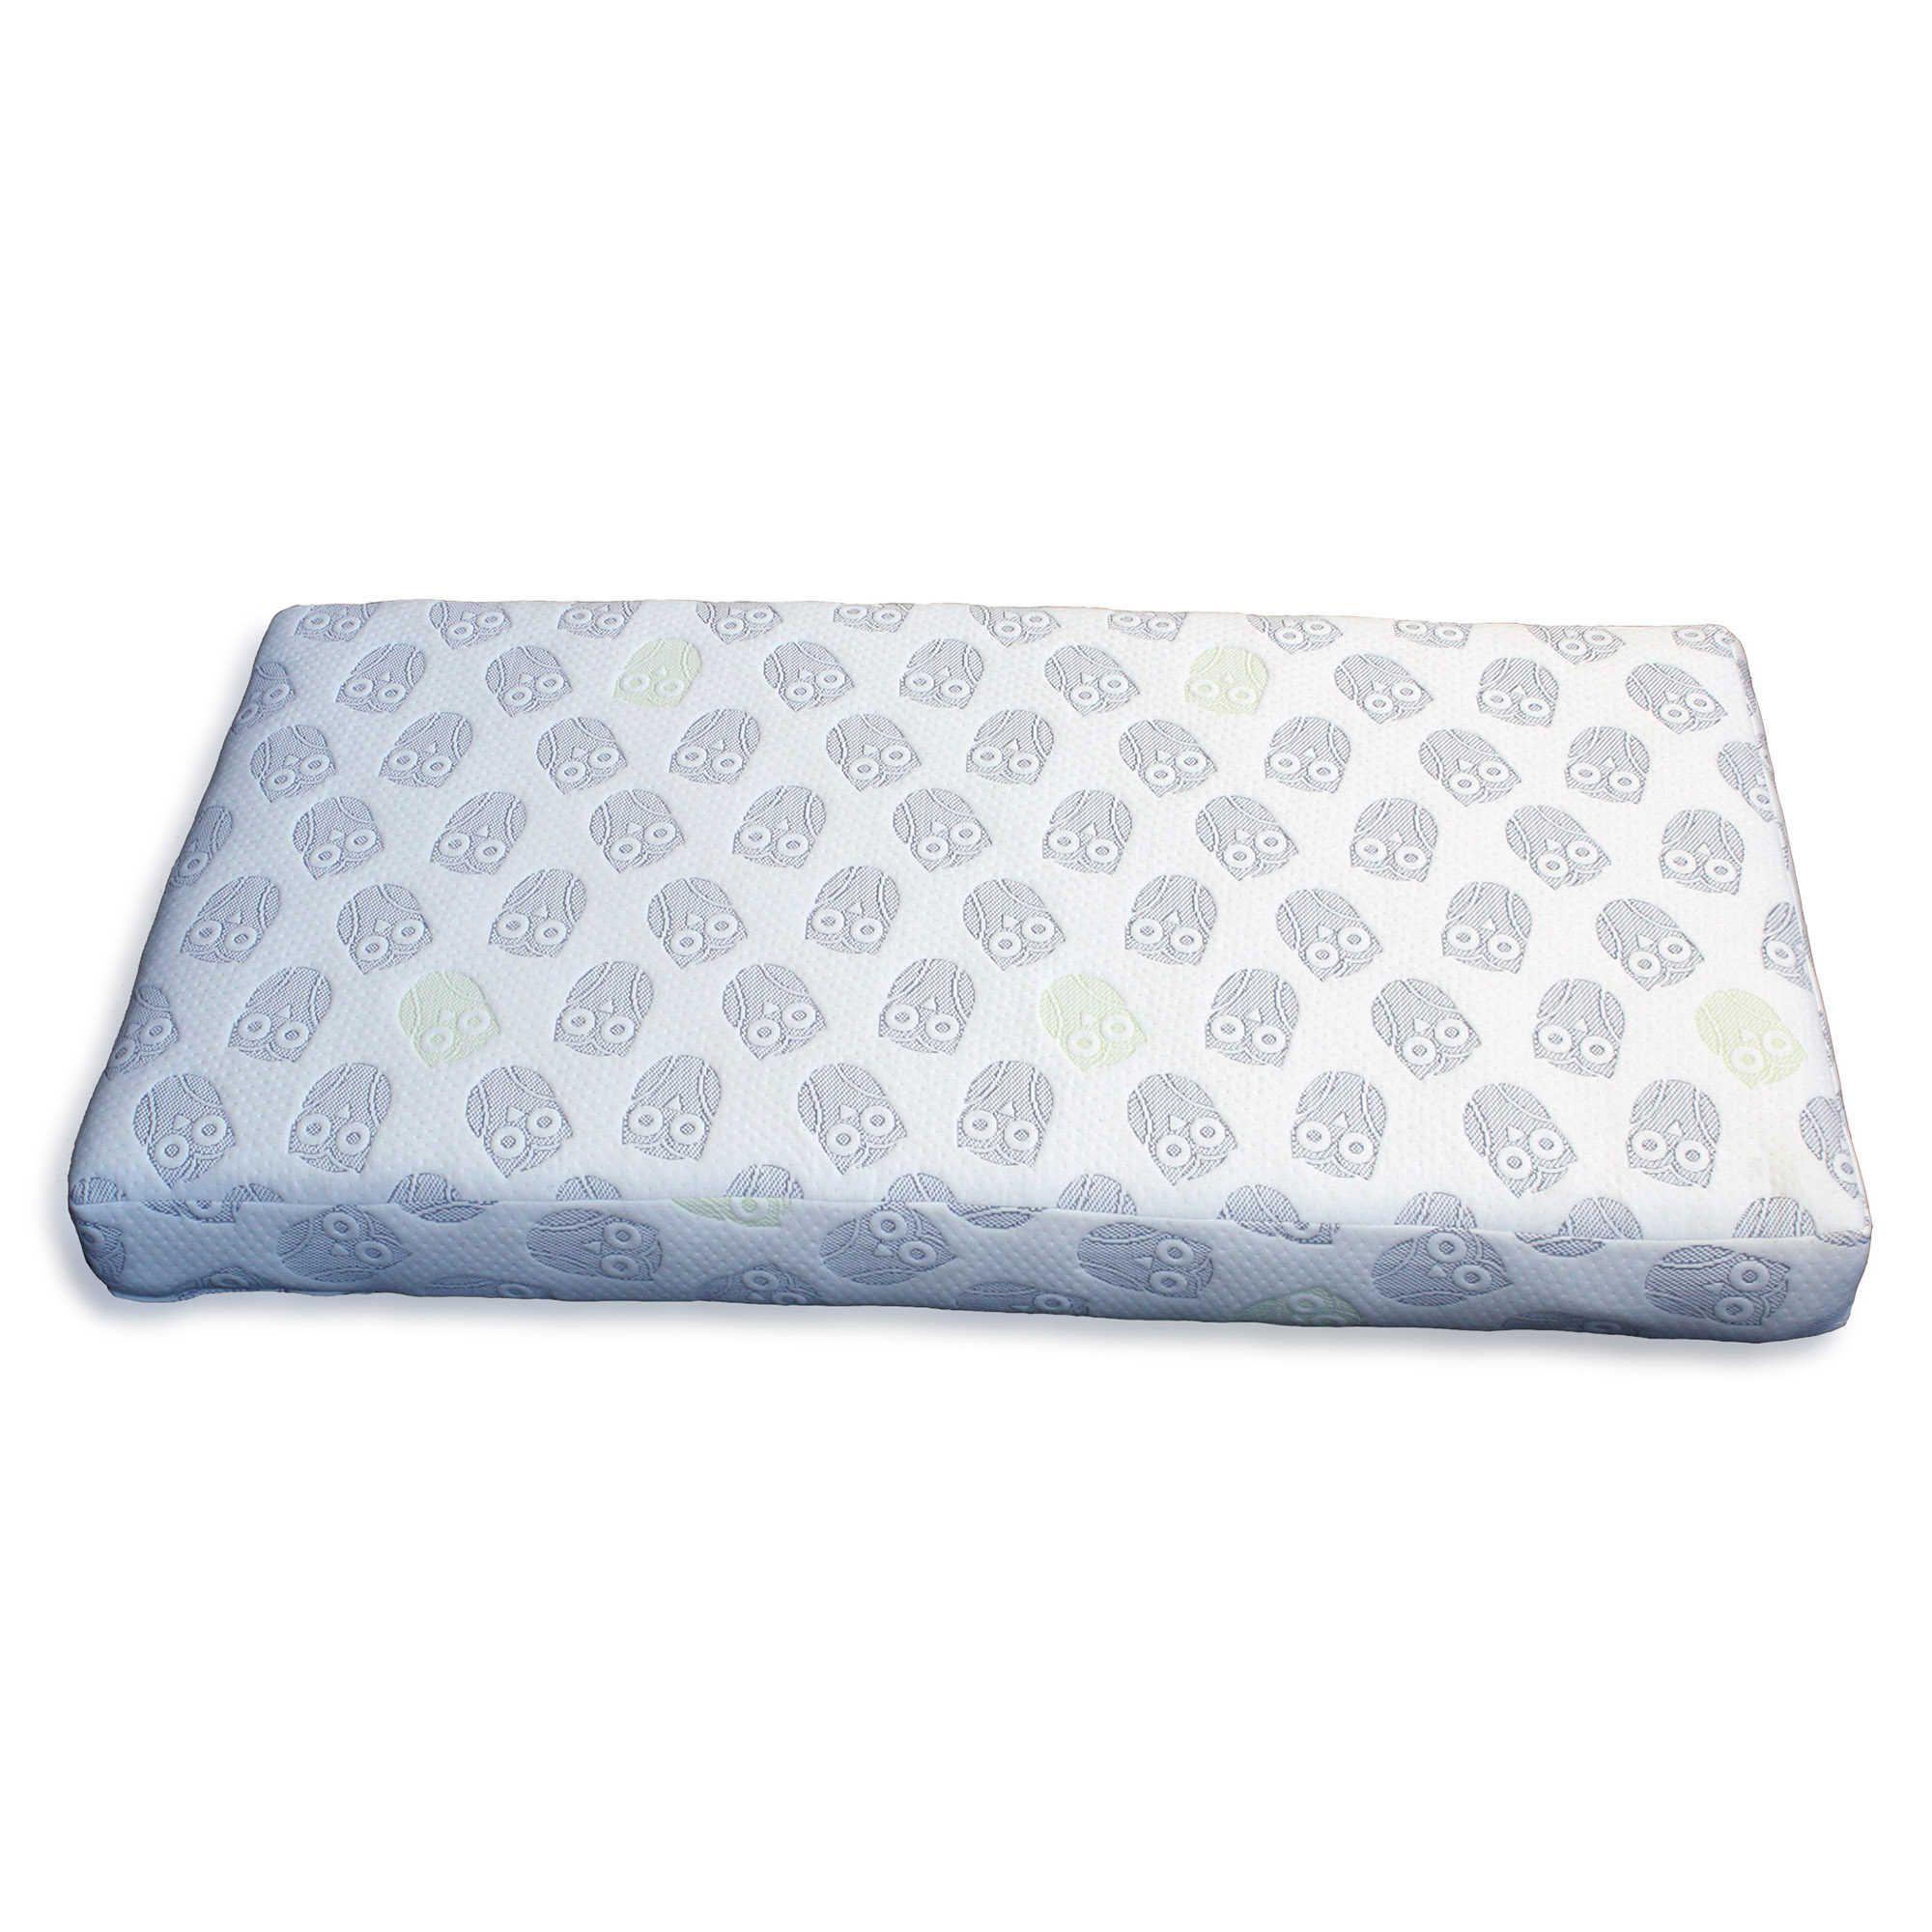 colgate breathe flex 2 stage crib mattress buybuybaby